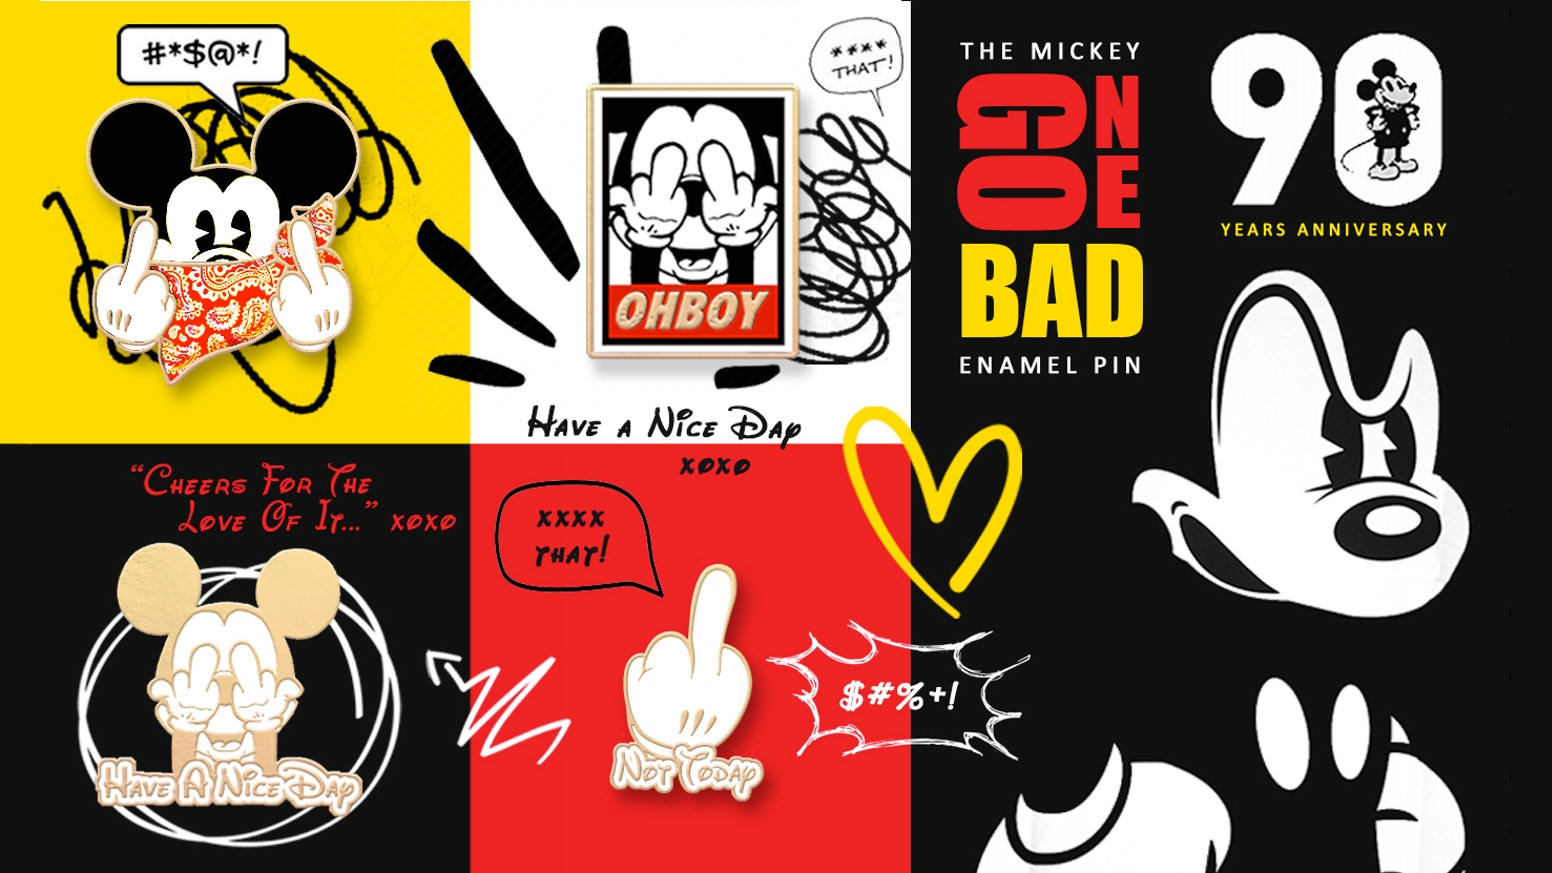 Make 100: Mickey Gone Bad enamel pins